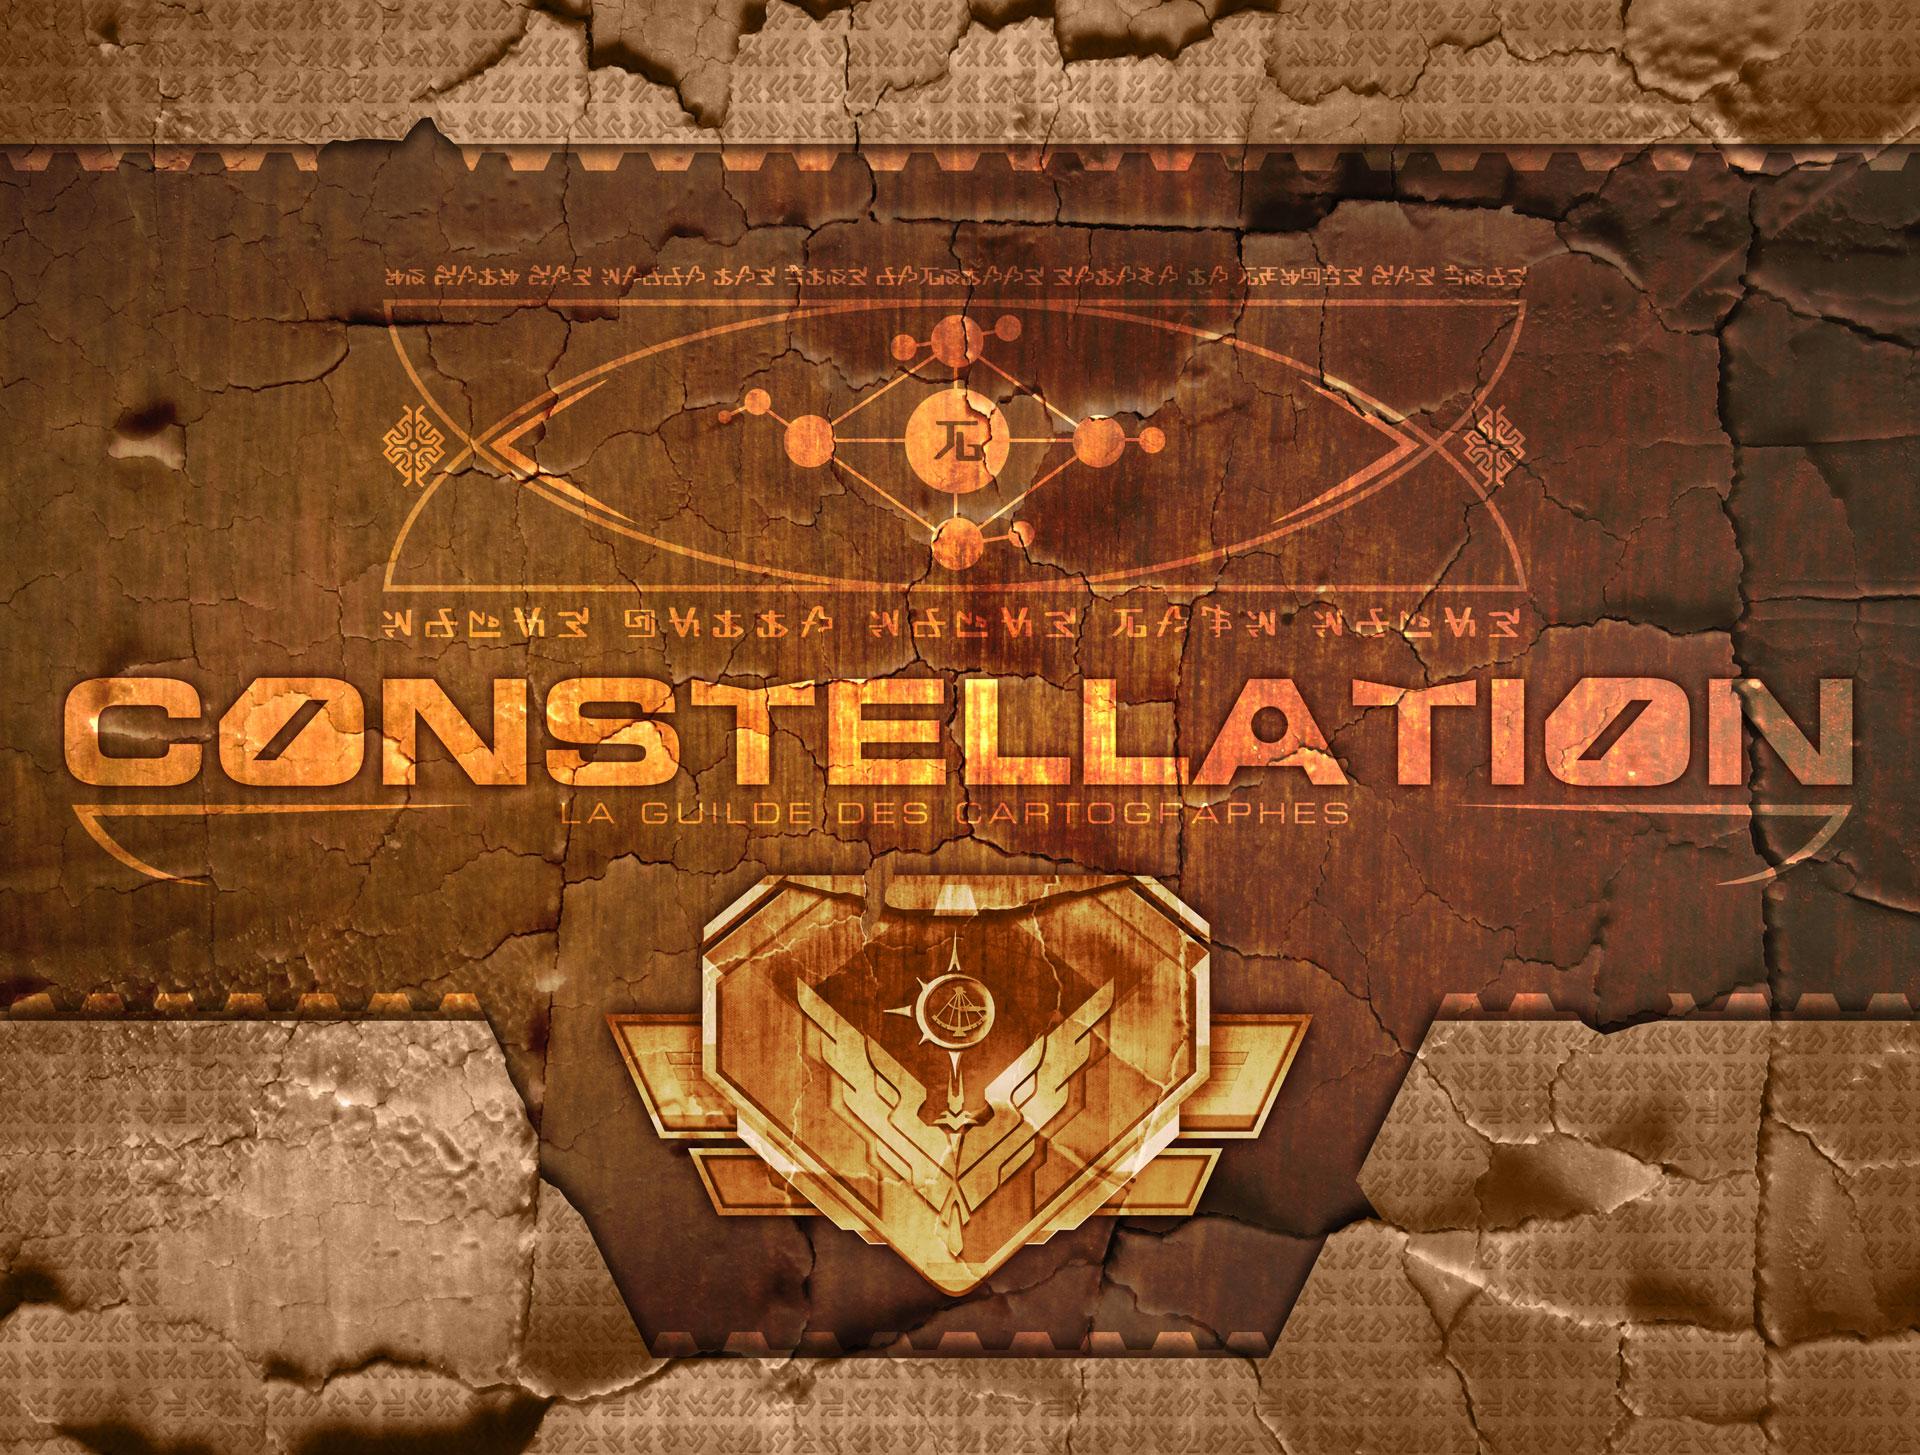 constellation_01_lgc_3303